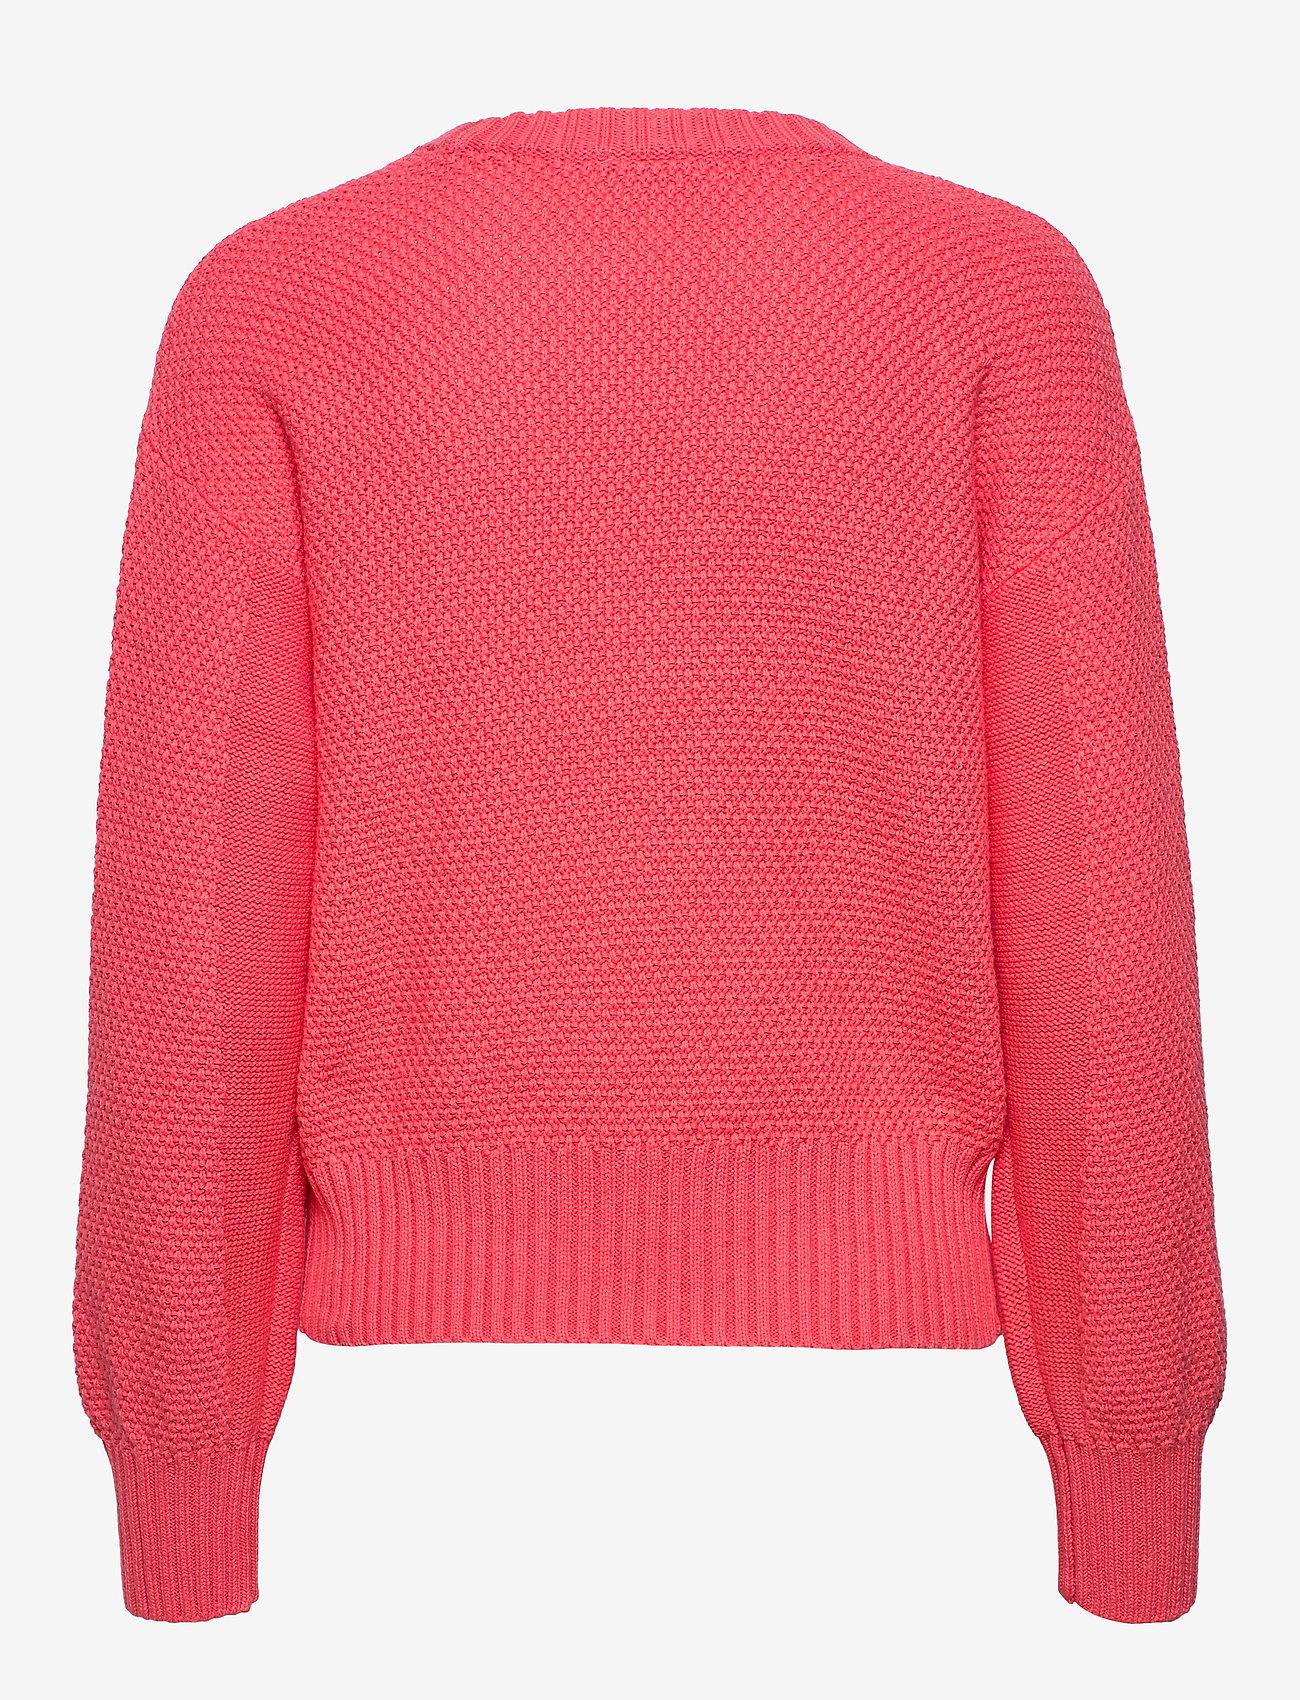 Mix-stitch Crewneck Sweater (Fresh Coral) - GAP 0vHjRS